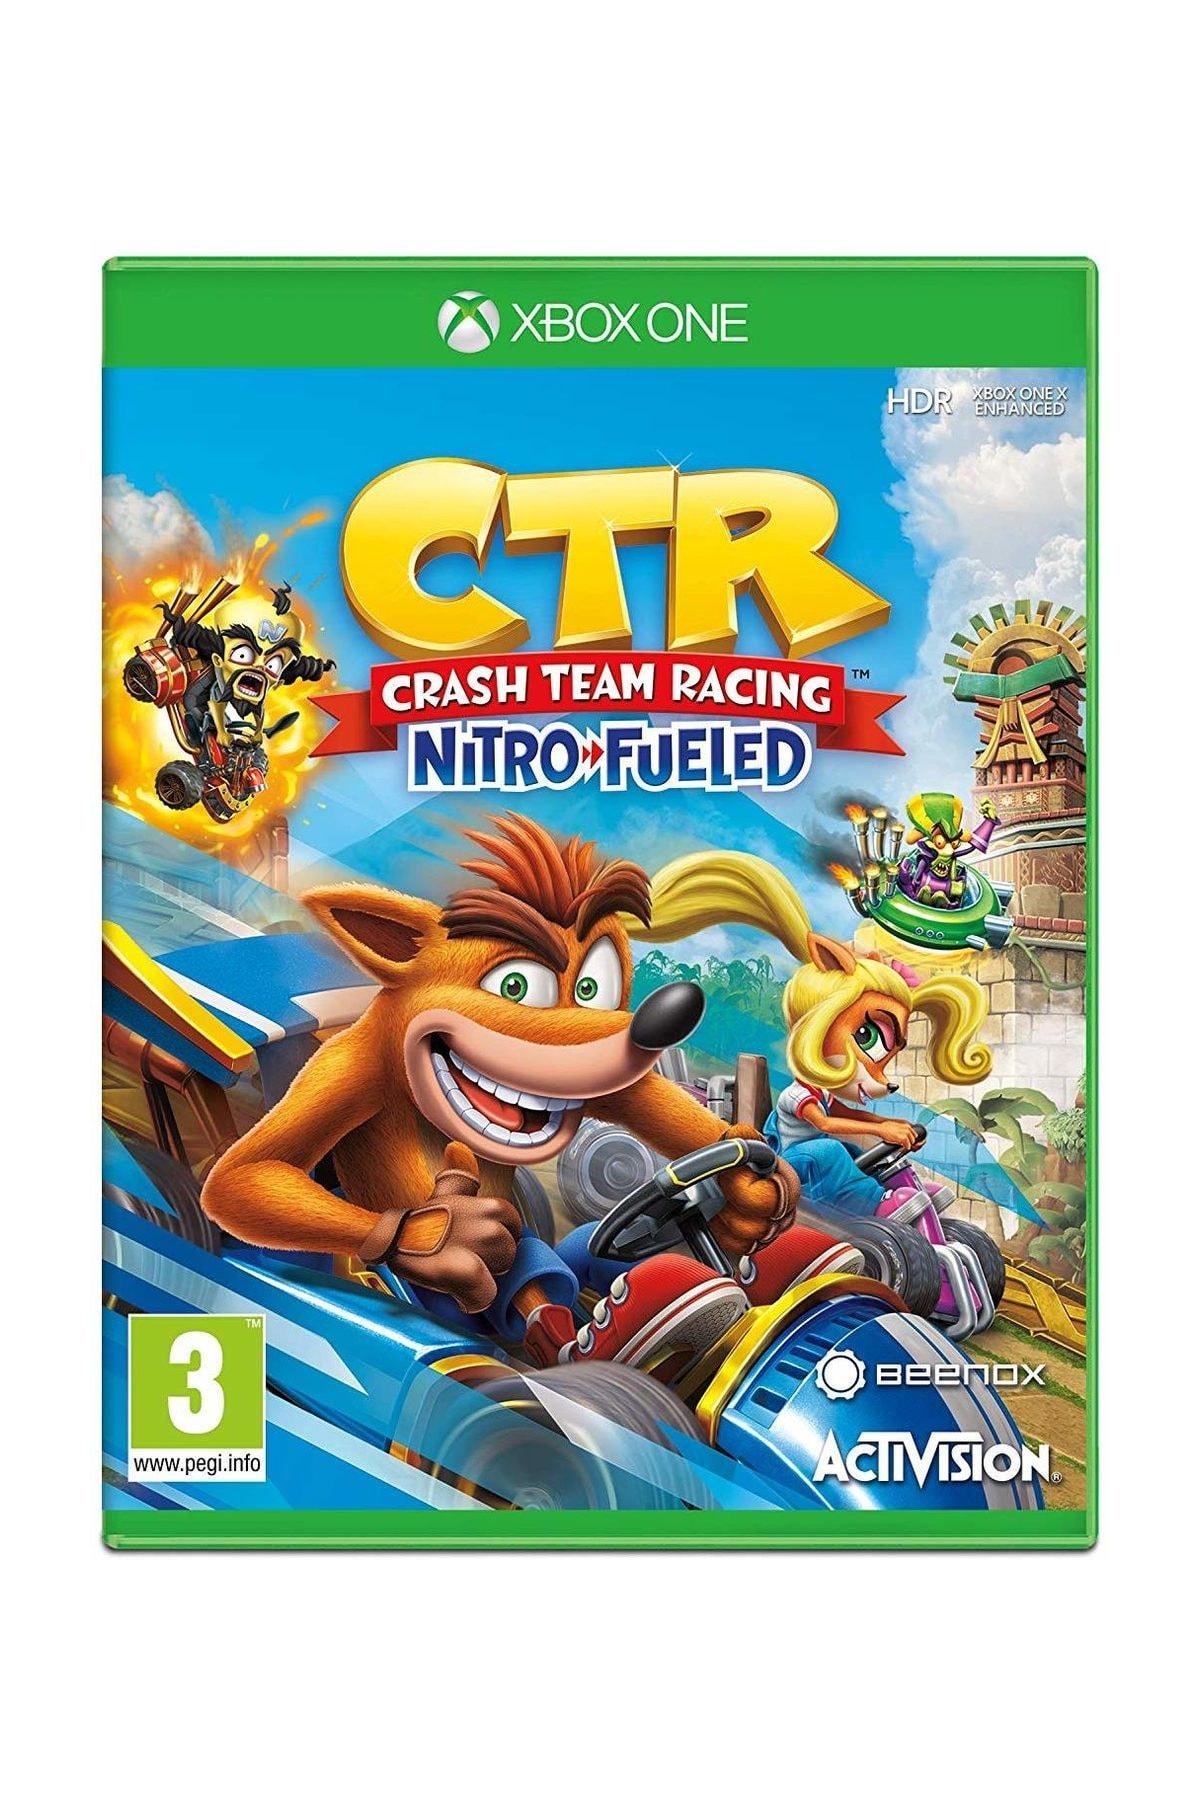 ACTIVISION Crash Team Racing Nitro Fueled Xbox One Oyun 1